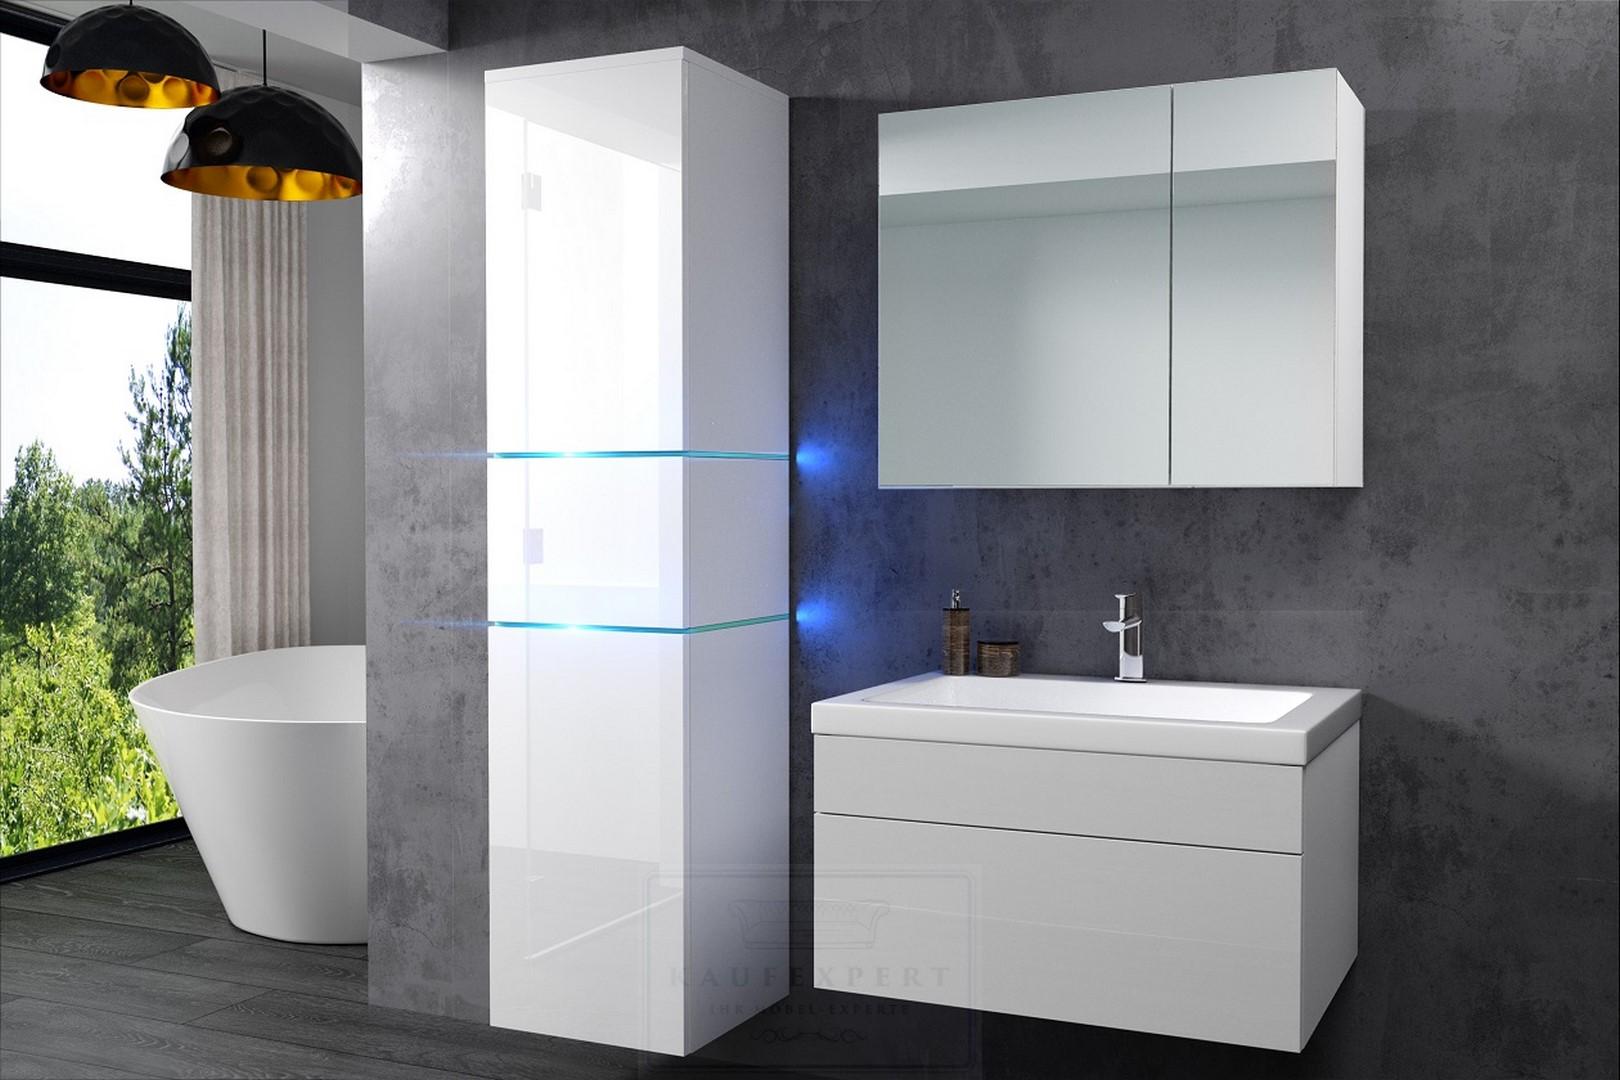 badm bel set ledox 170 rot hochglanz schwarz led beleuchtung badezimmerm bel ebay. Black Bedroom Furniture Sets. Home Design Ideas